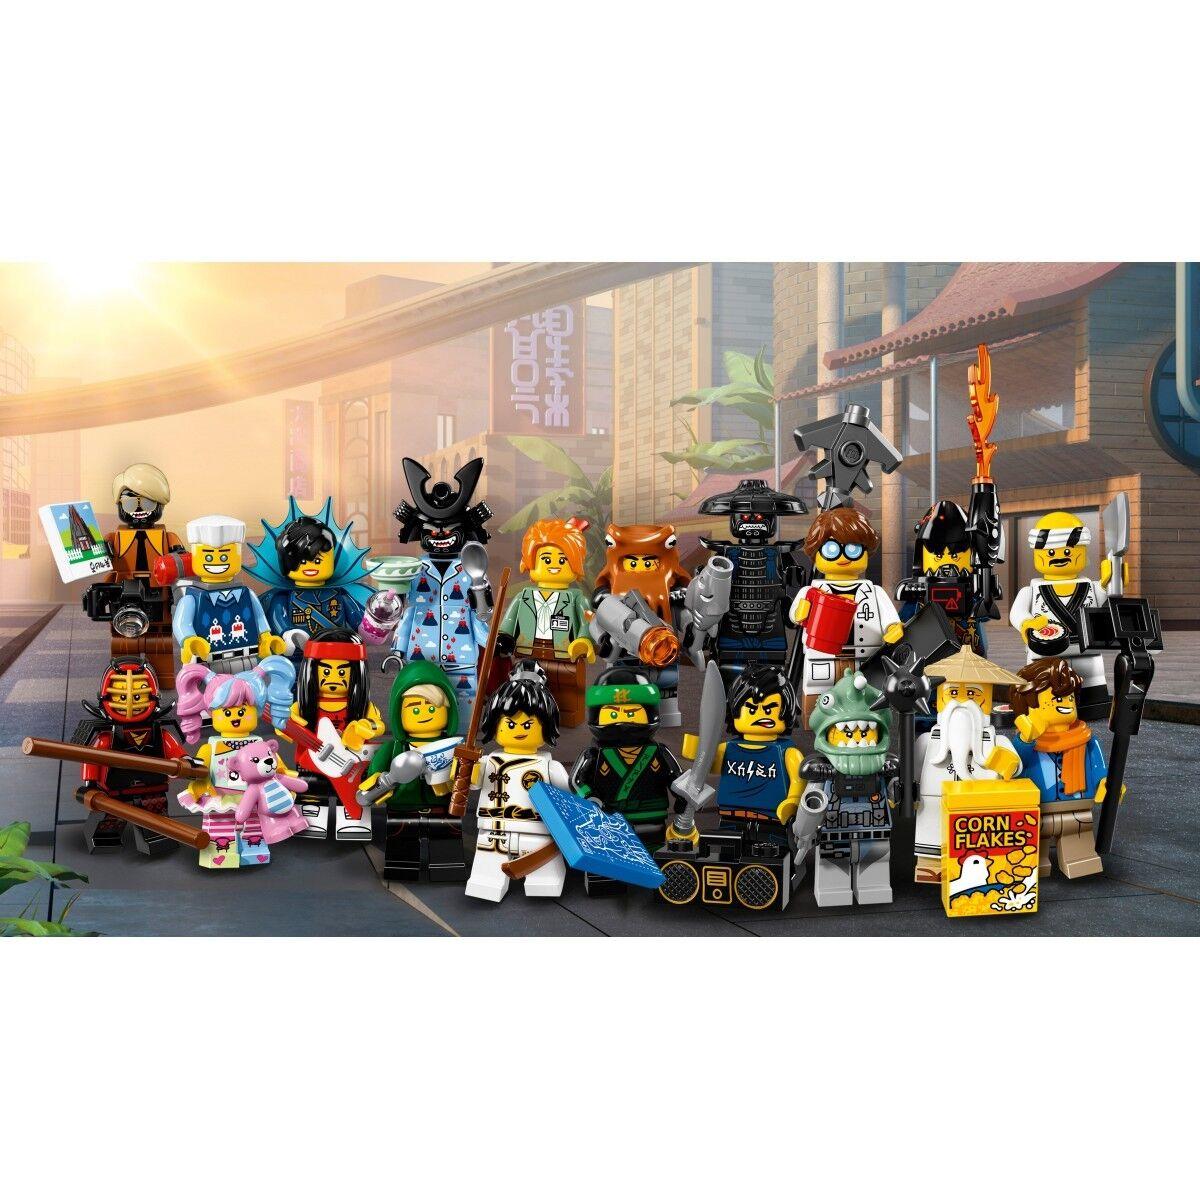 LEGO 71019 Ninjago Movie statuine MINIFIGURES 20 versetto carattere.